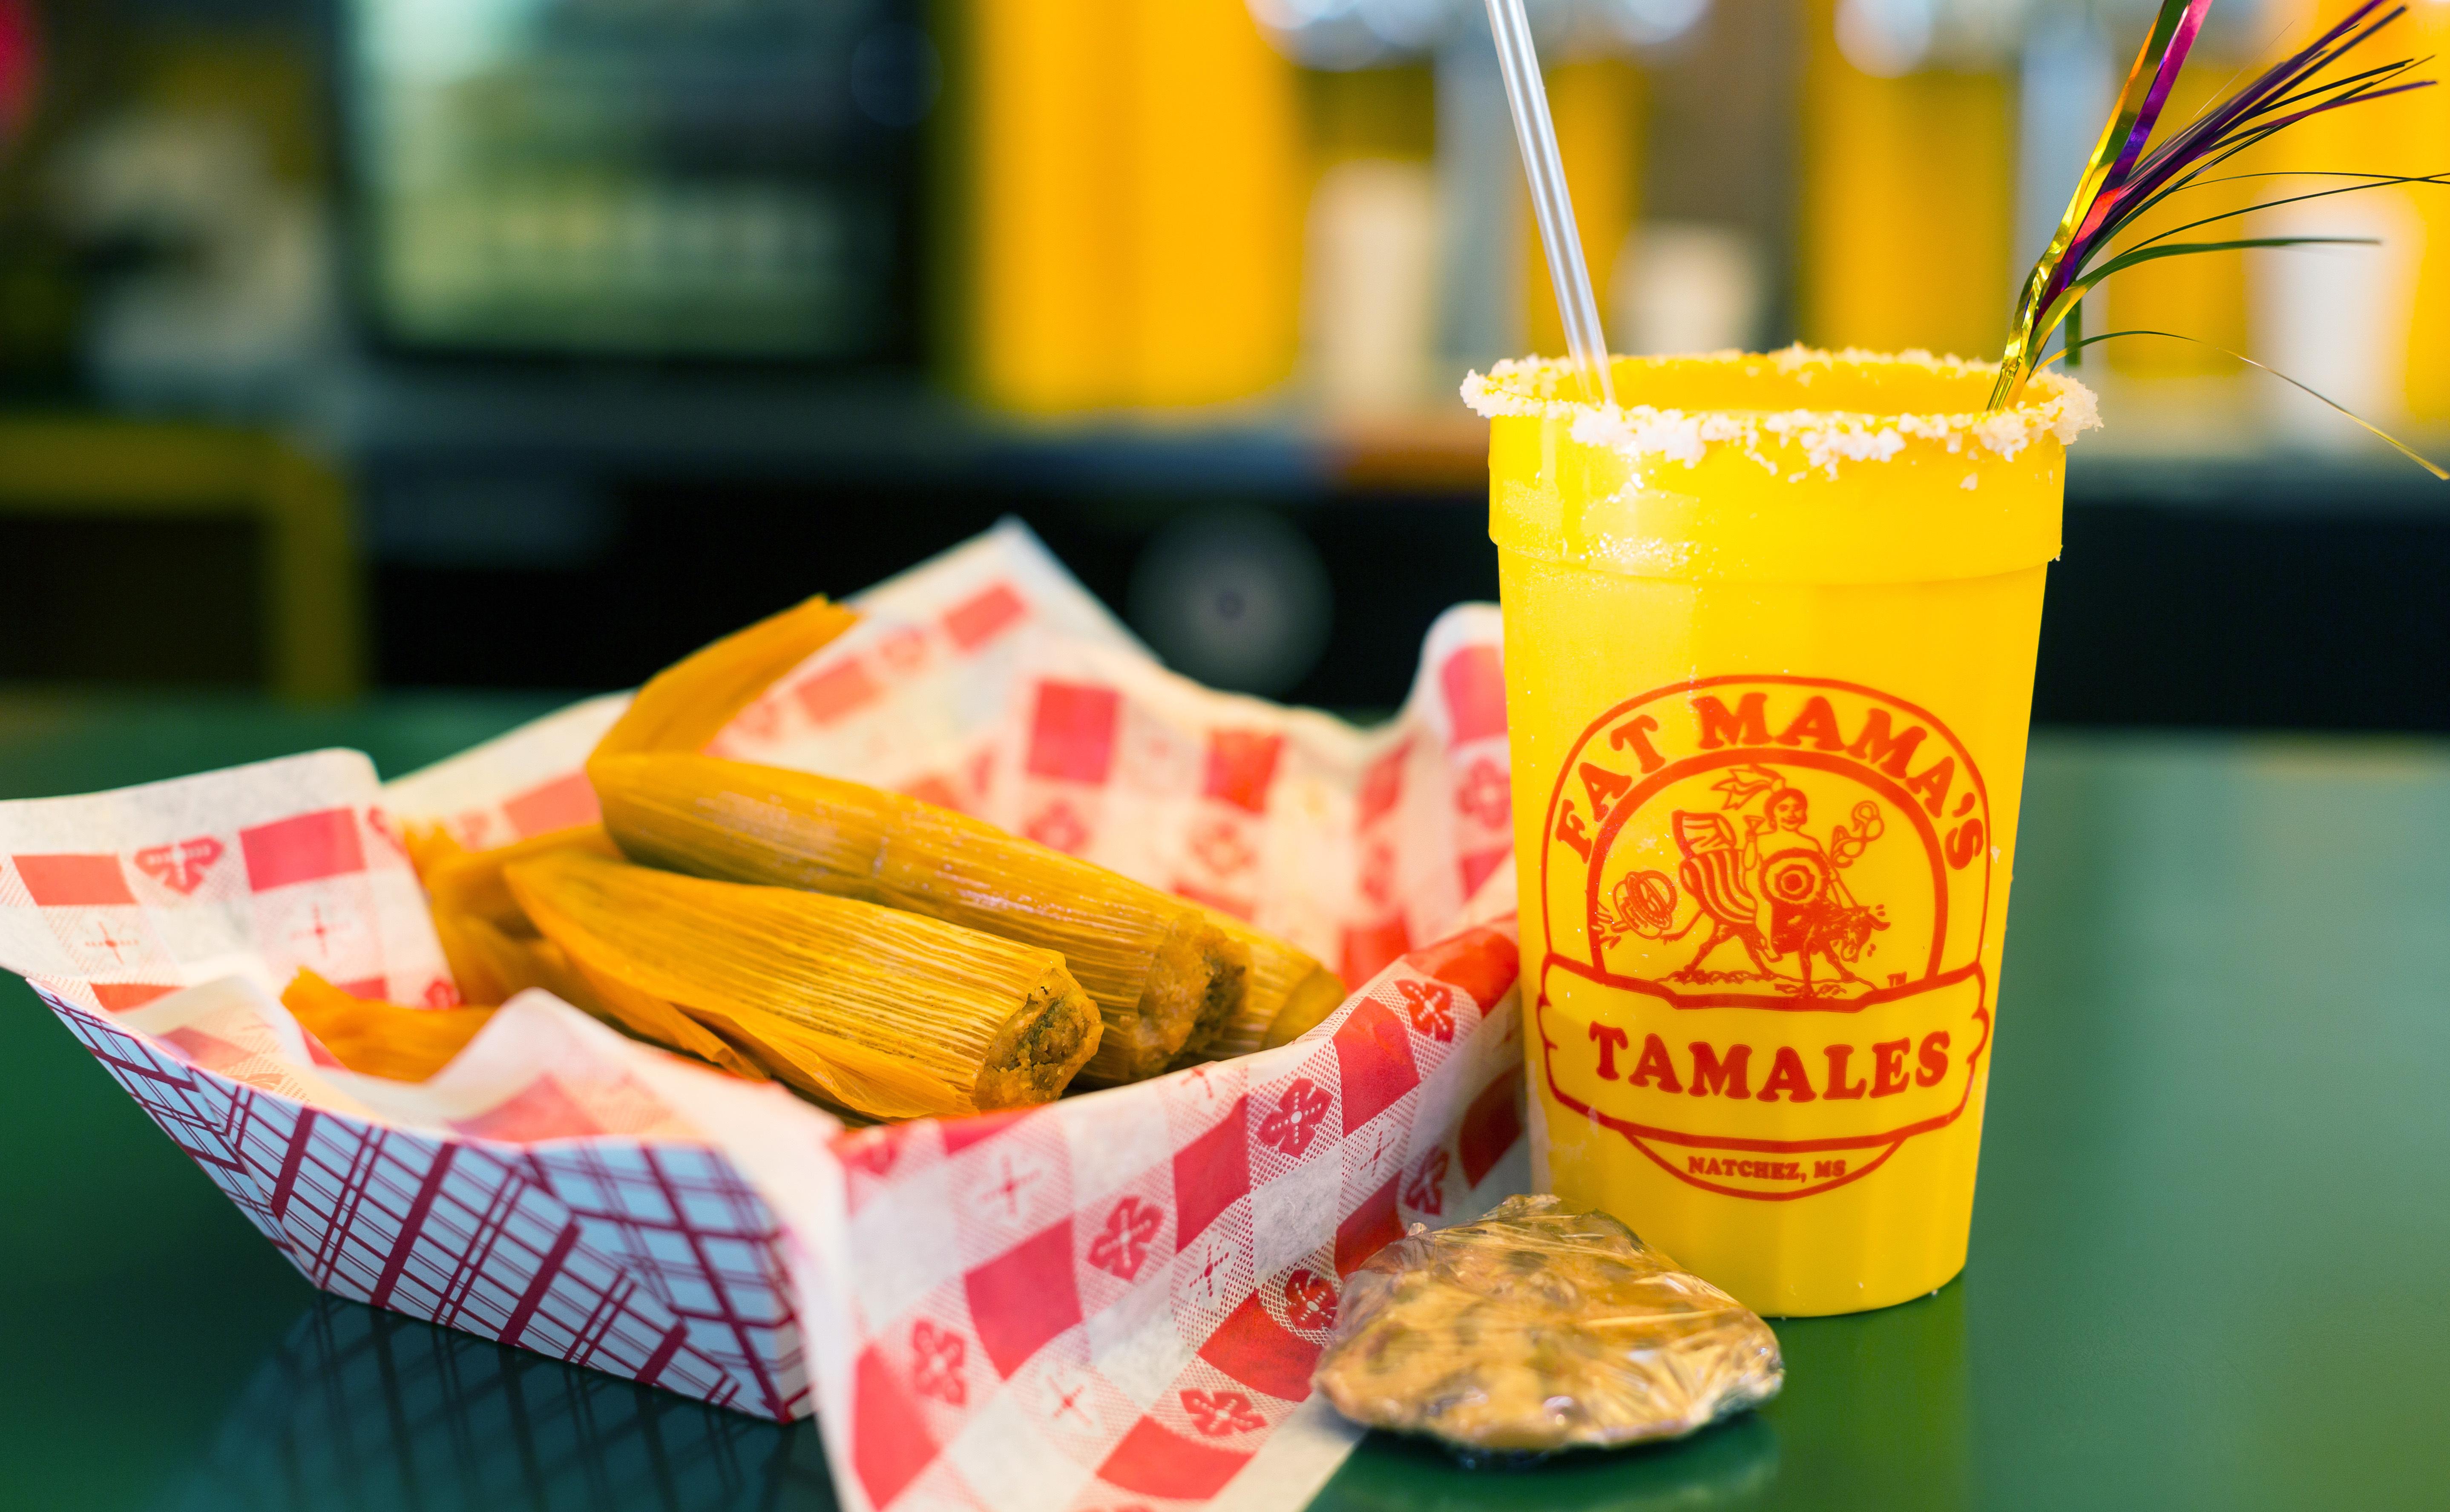 20161014-natchez-fat-mamas-tamales-20.jpg?mtime=20180524152935#asset:101904